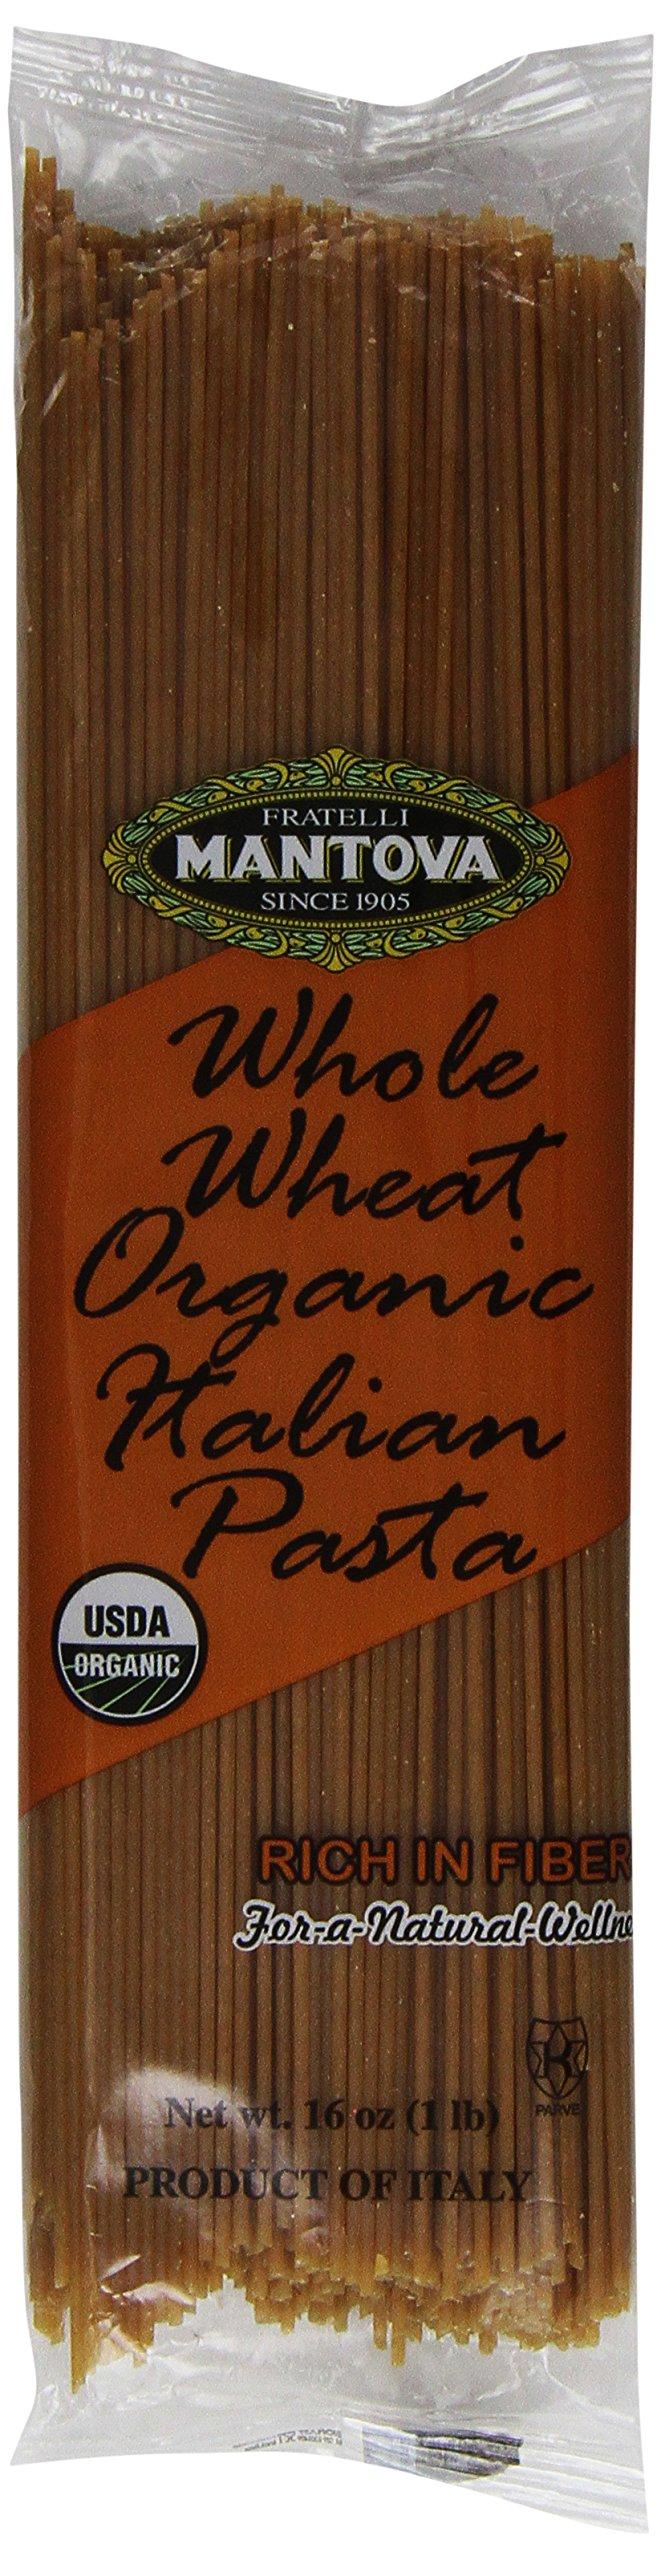 Mantova Italian Organic Spaghetti Whole Wheat Pasta, 1-Pound Bags (Pack of 10).